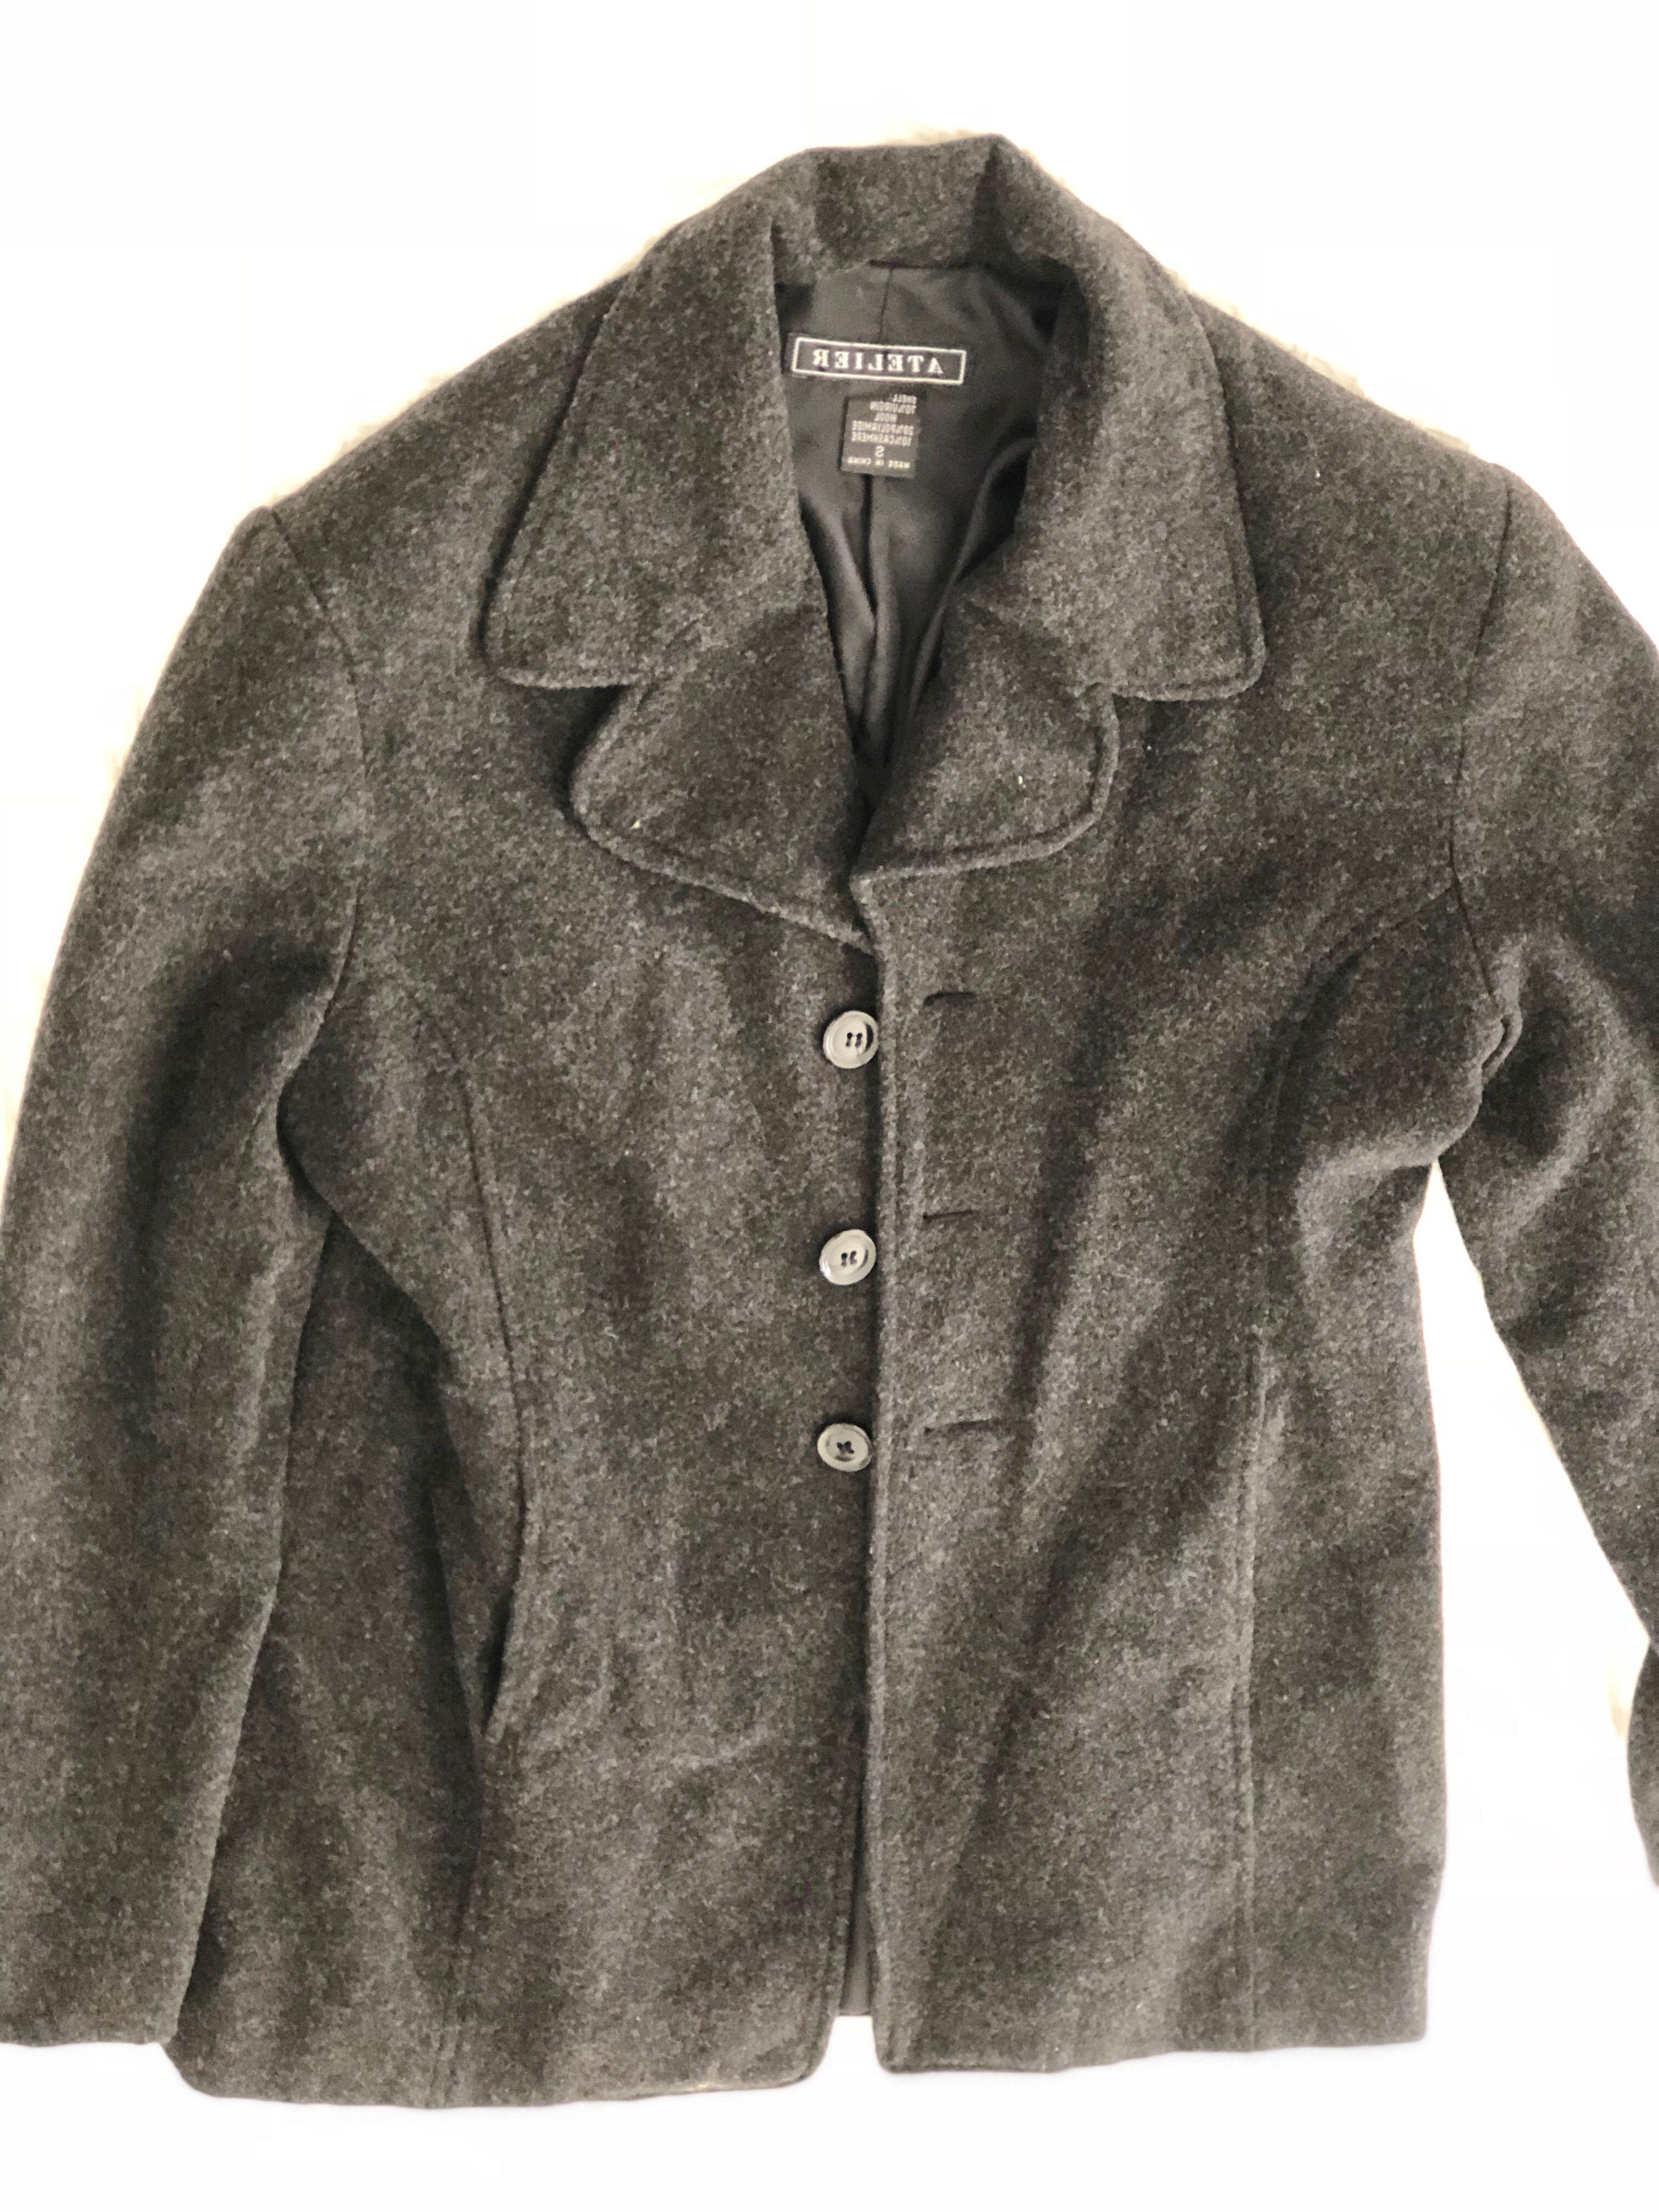 Dark grey jacket size s